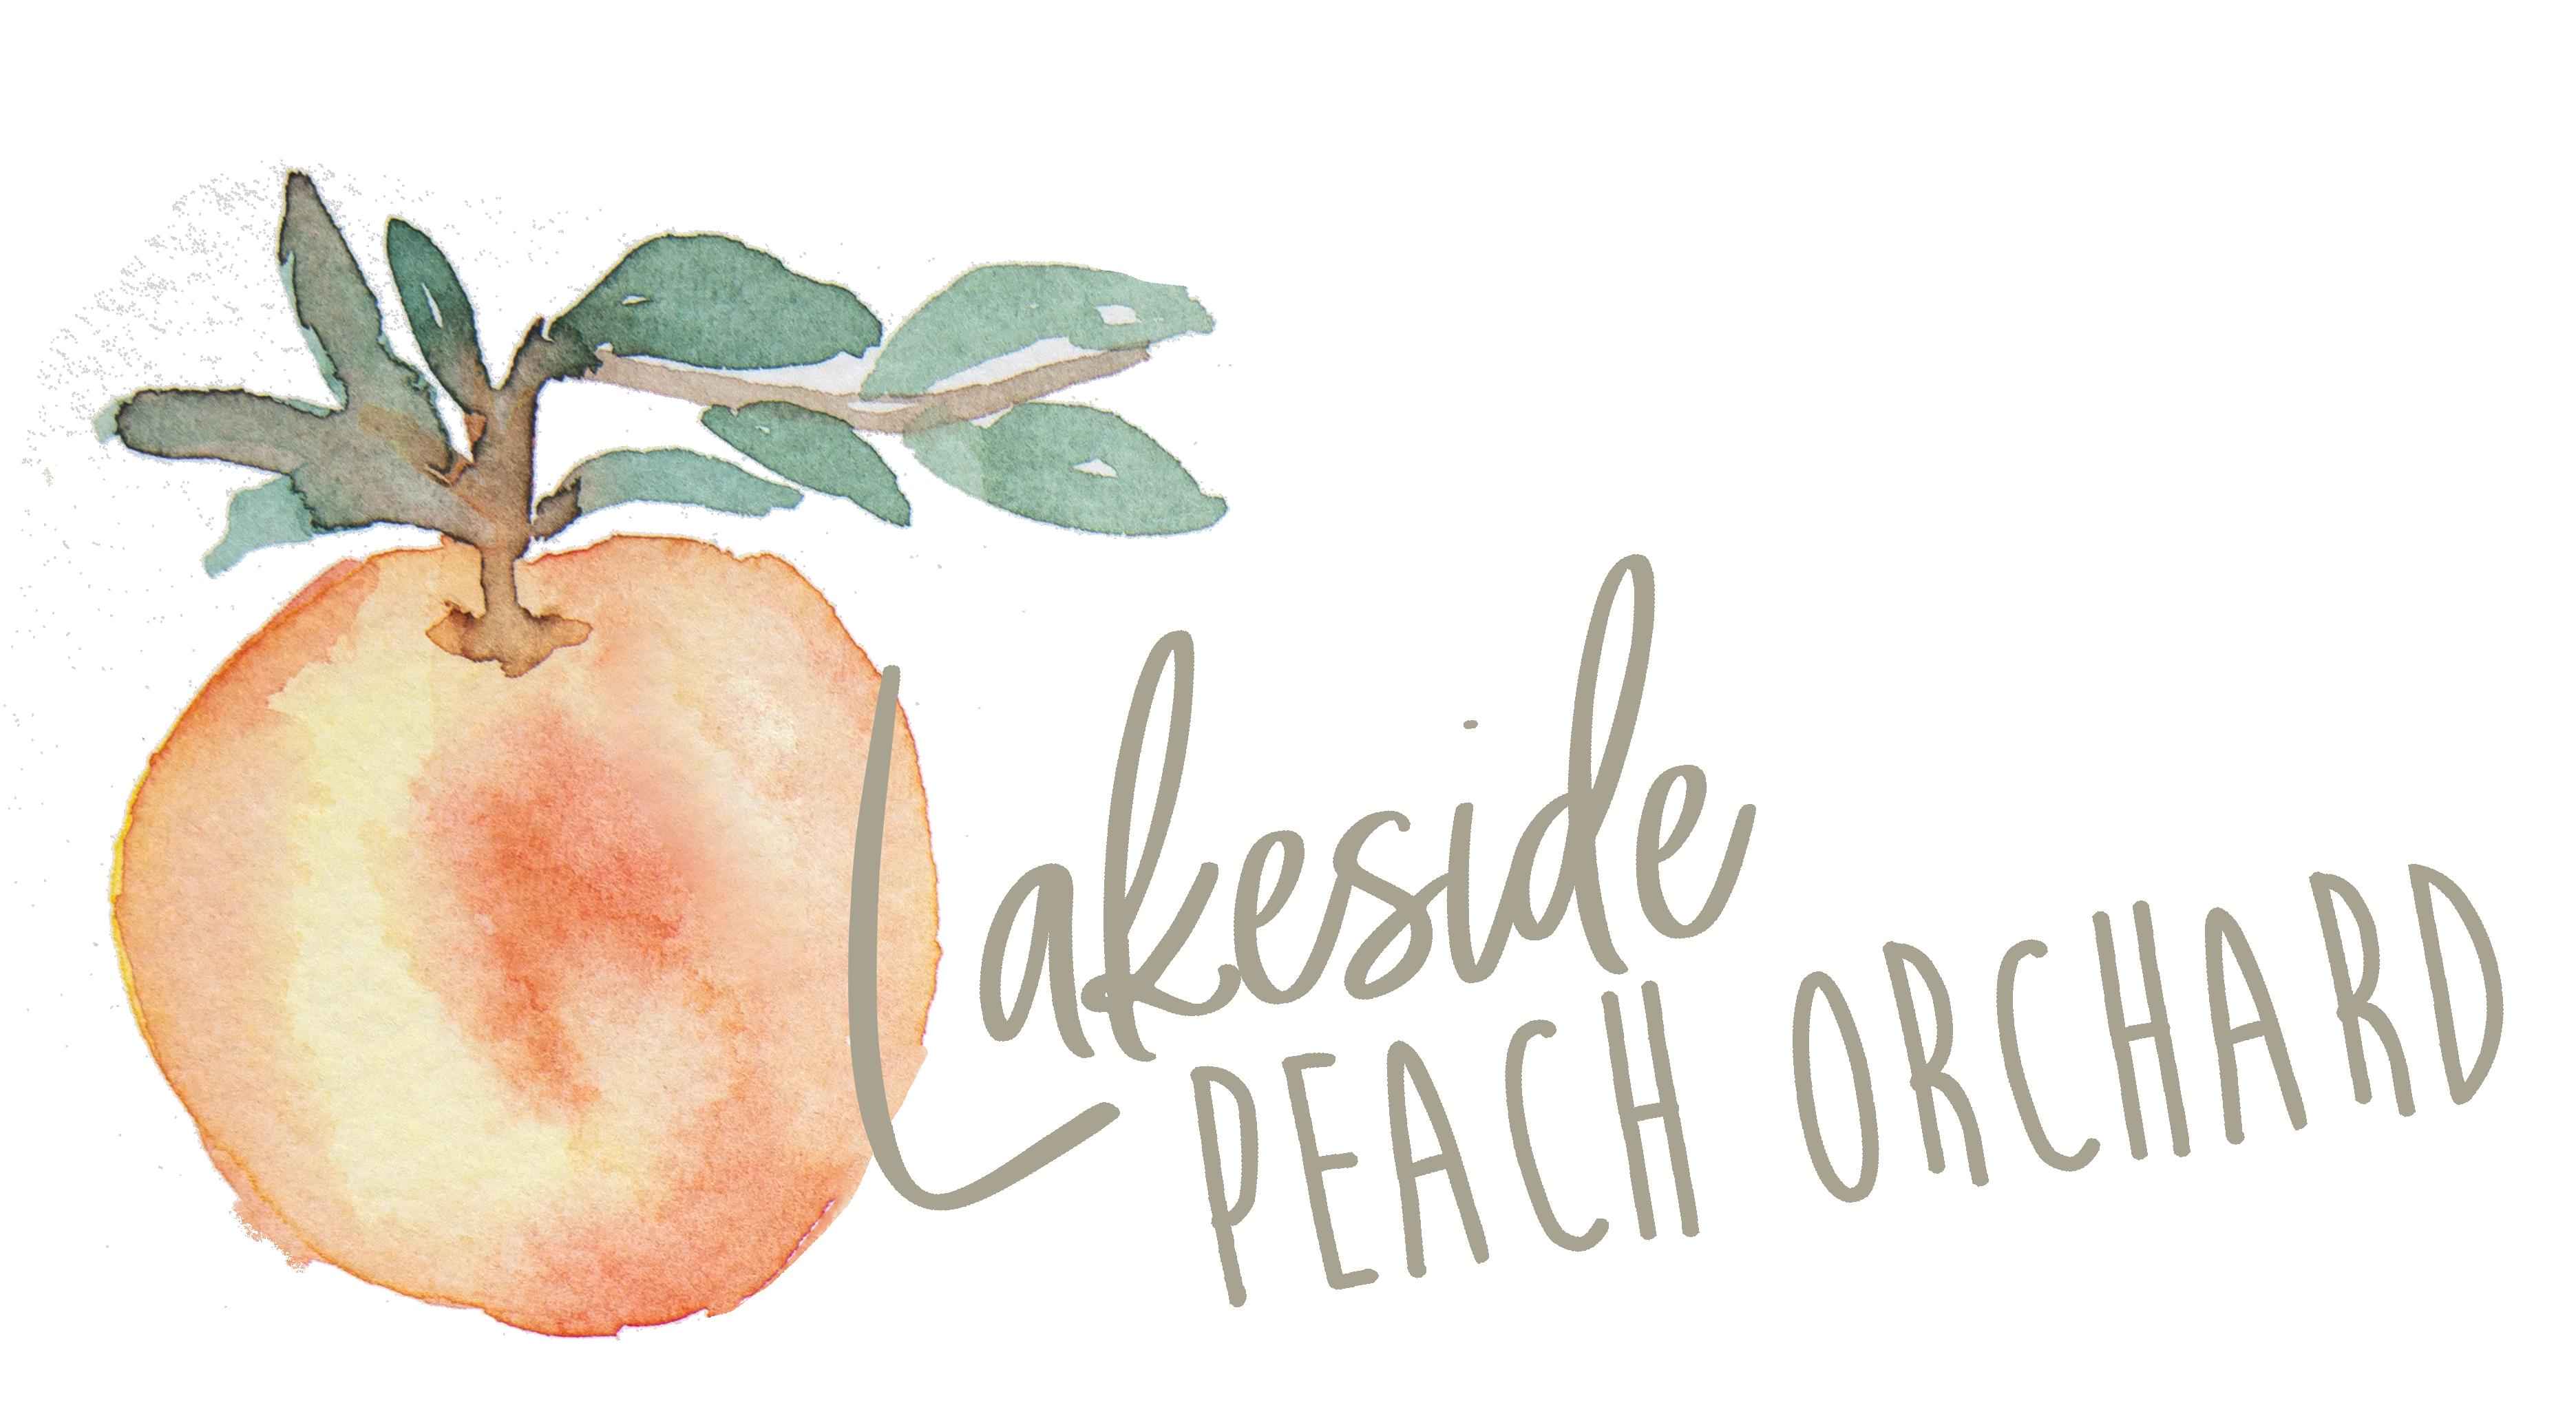 Lakeside Peach Orchard | Monroe, NC USA